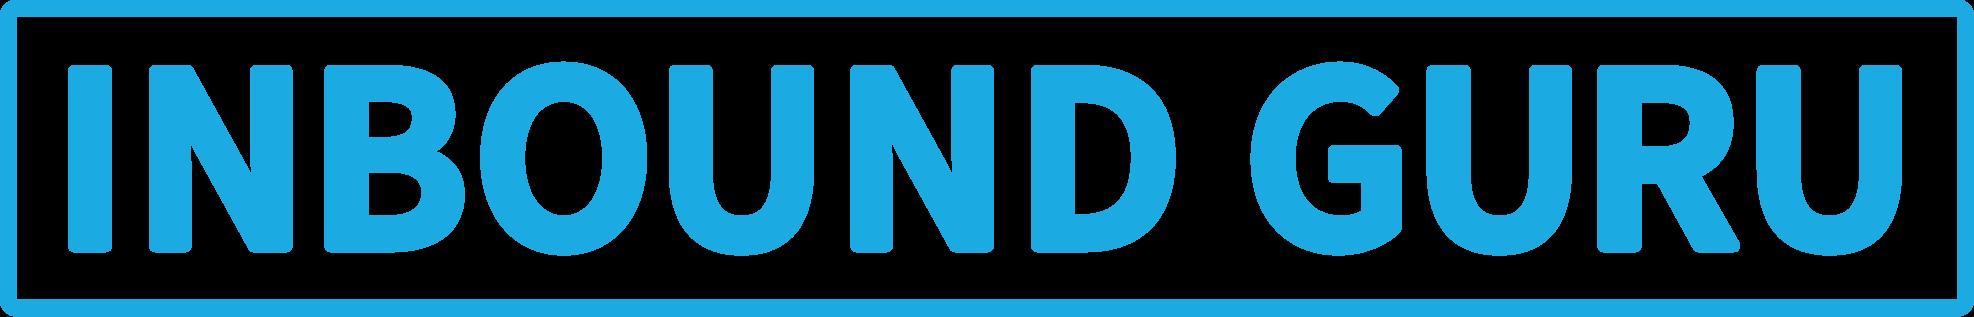 ingu-inbound-guru-logo-v2-4a.png